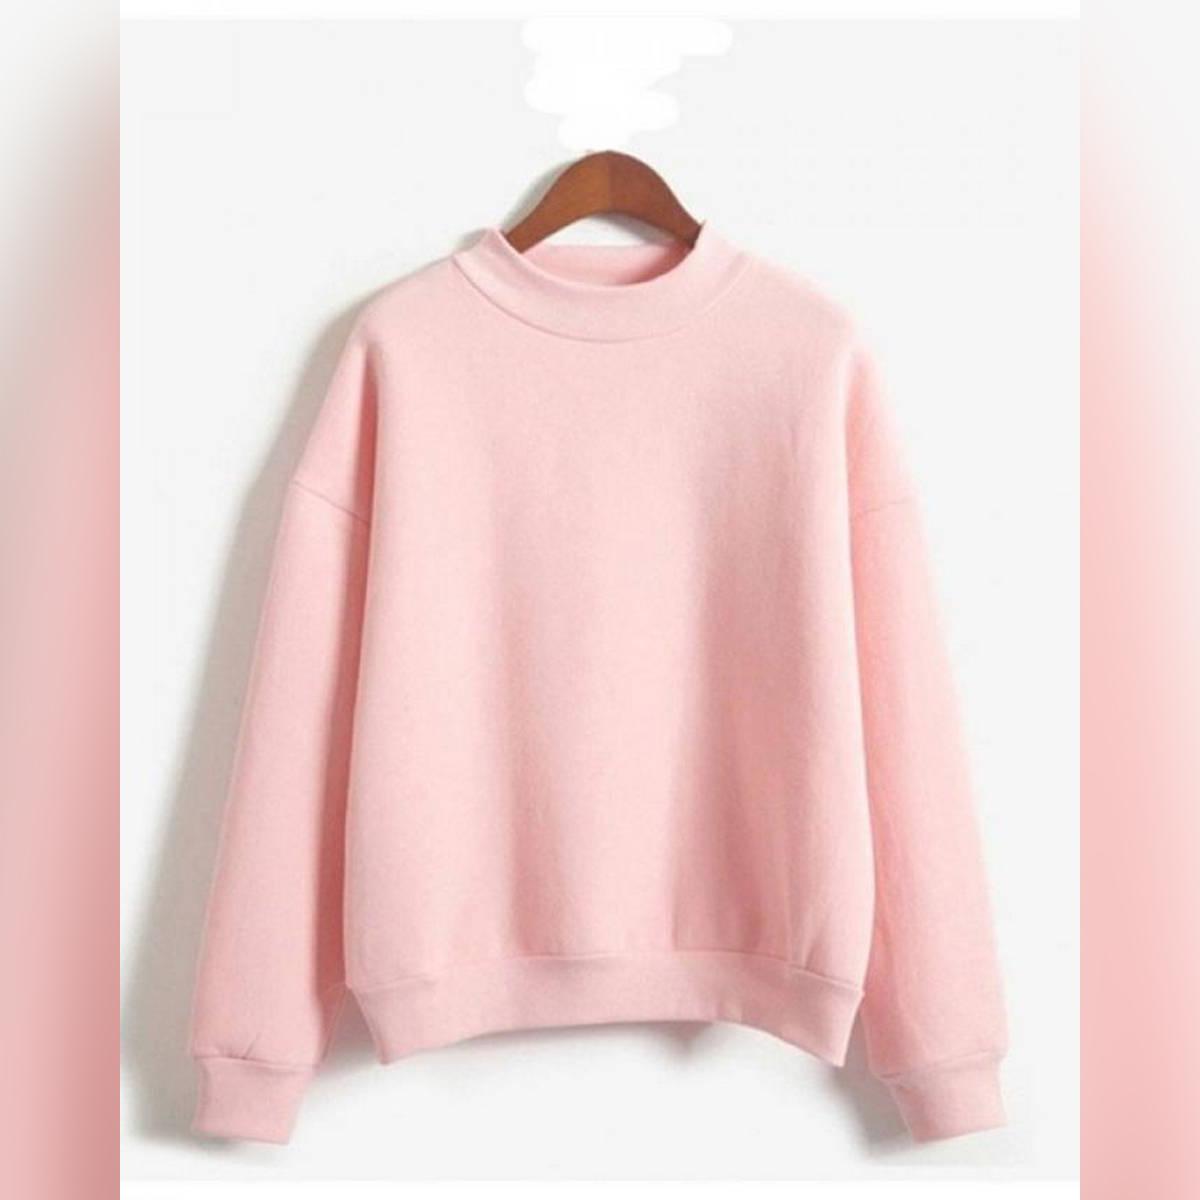 Sweatshirt 2018 Winter Casual Loose Fleece Pullover Baby Pink